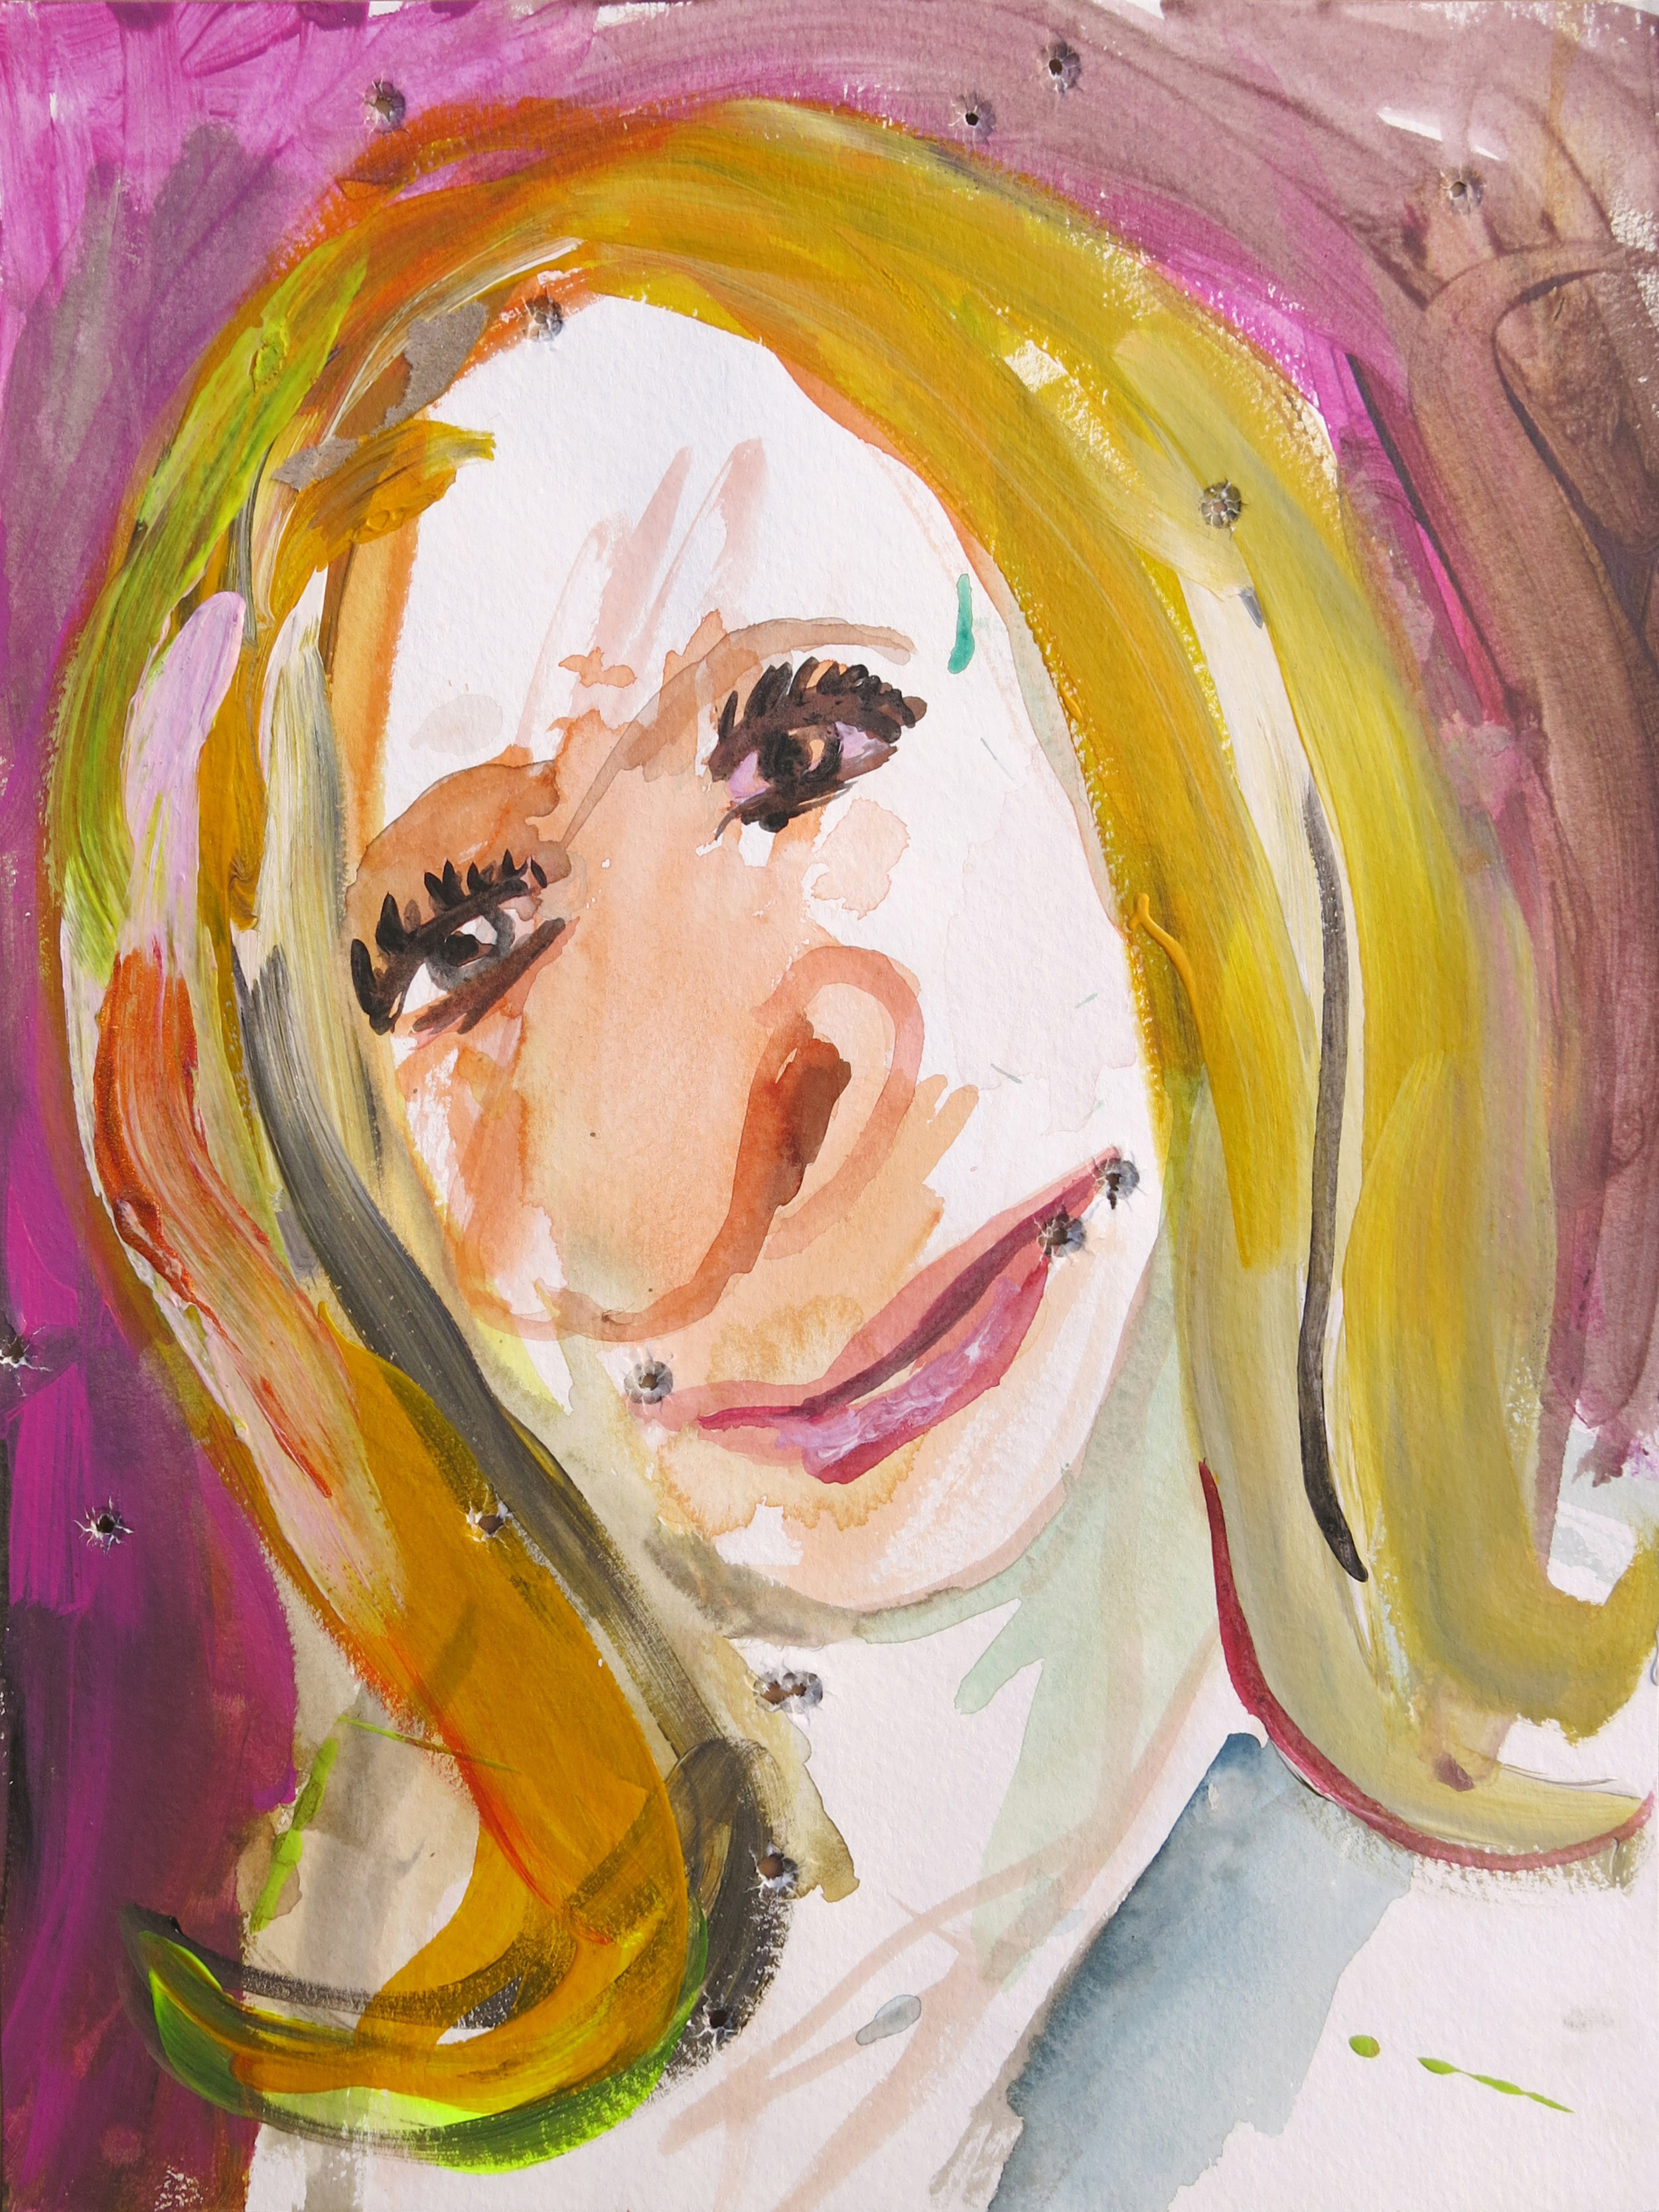 Barbra Streisand Portrait #32